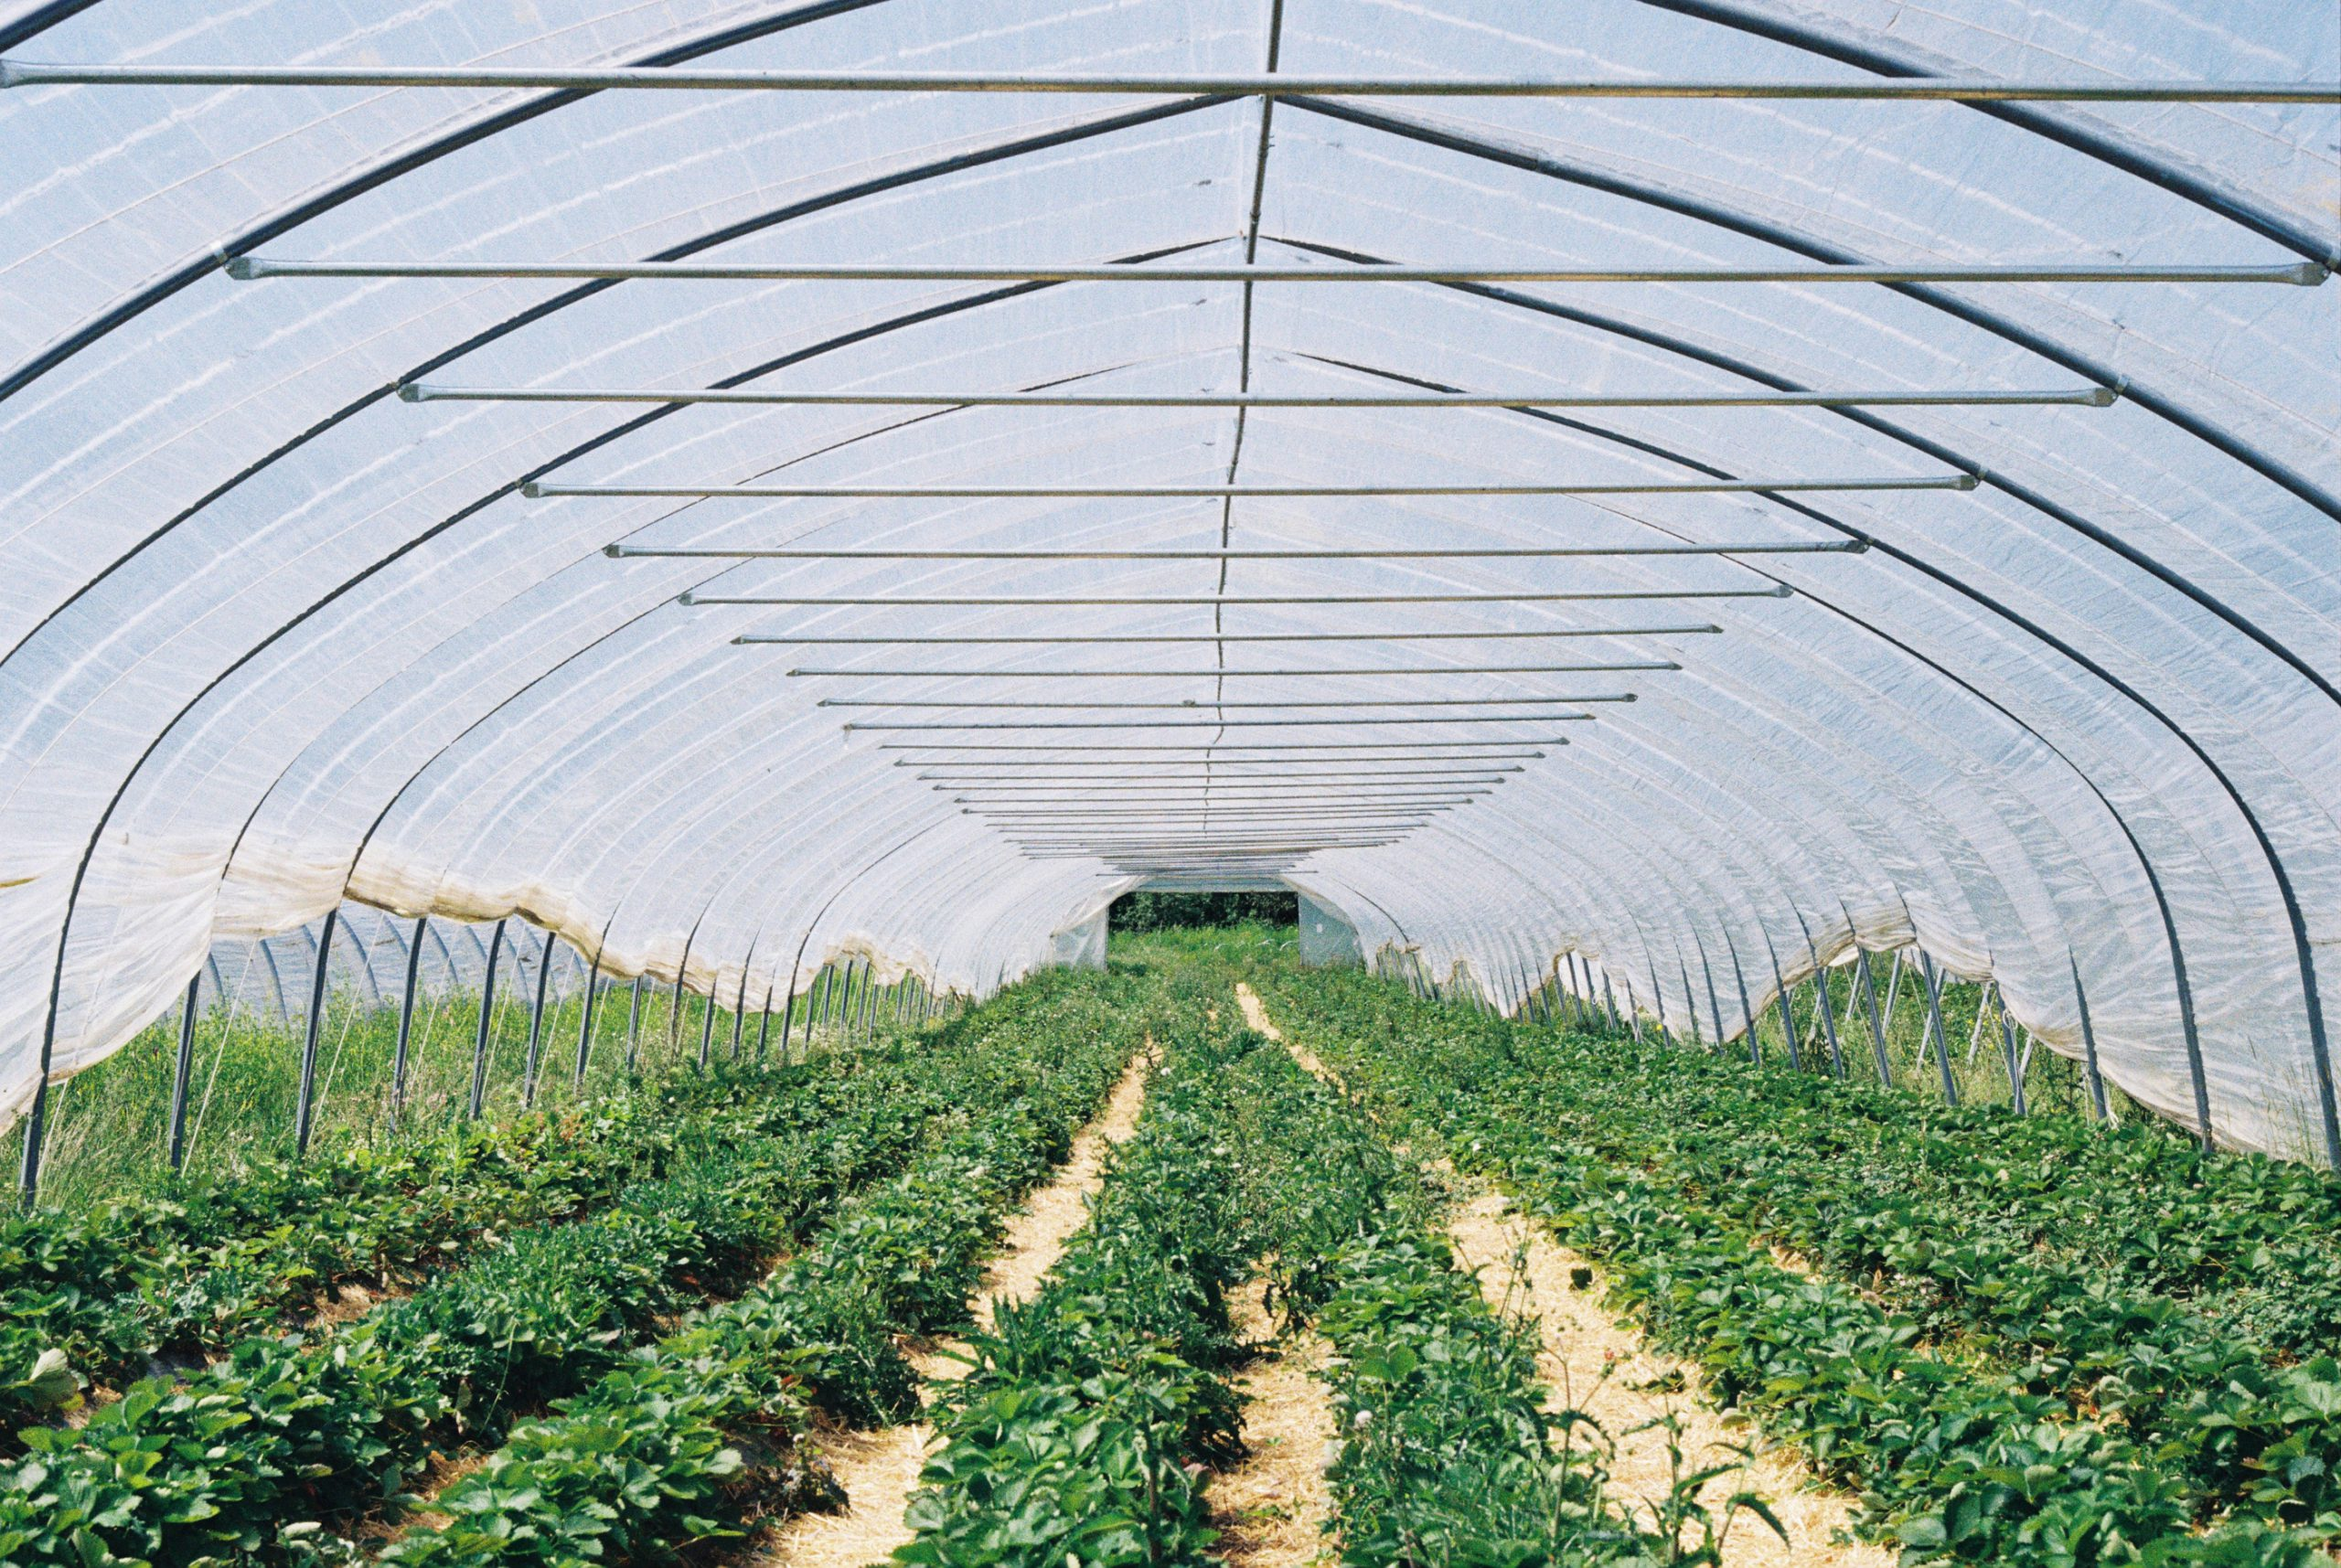 Strawberry lanes. Zeiss Ikon mit Biogon 25/2.8 ZM. Kodak Gold 200